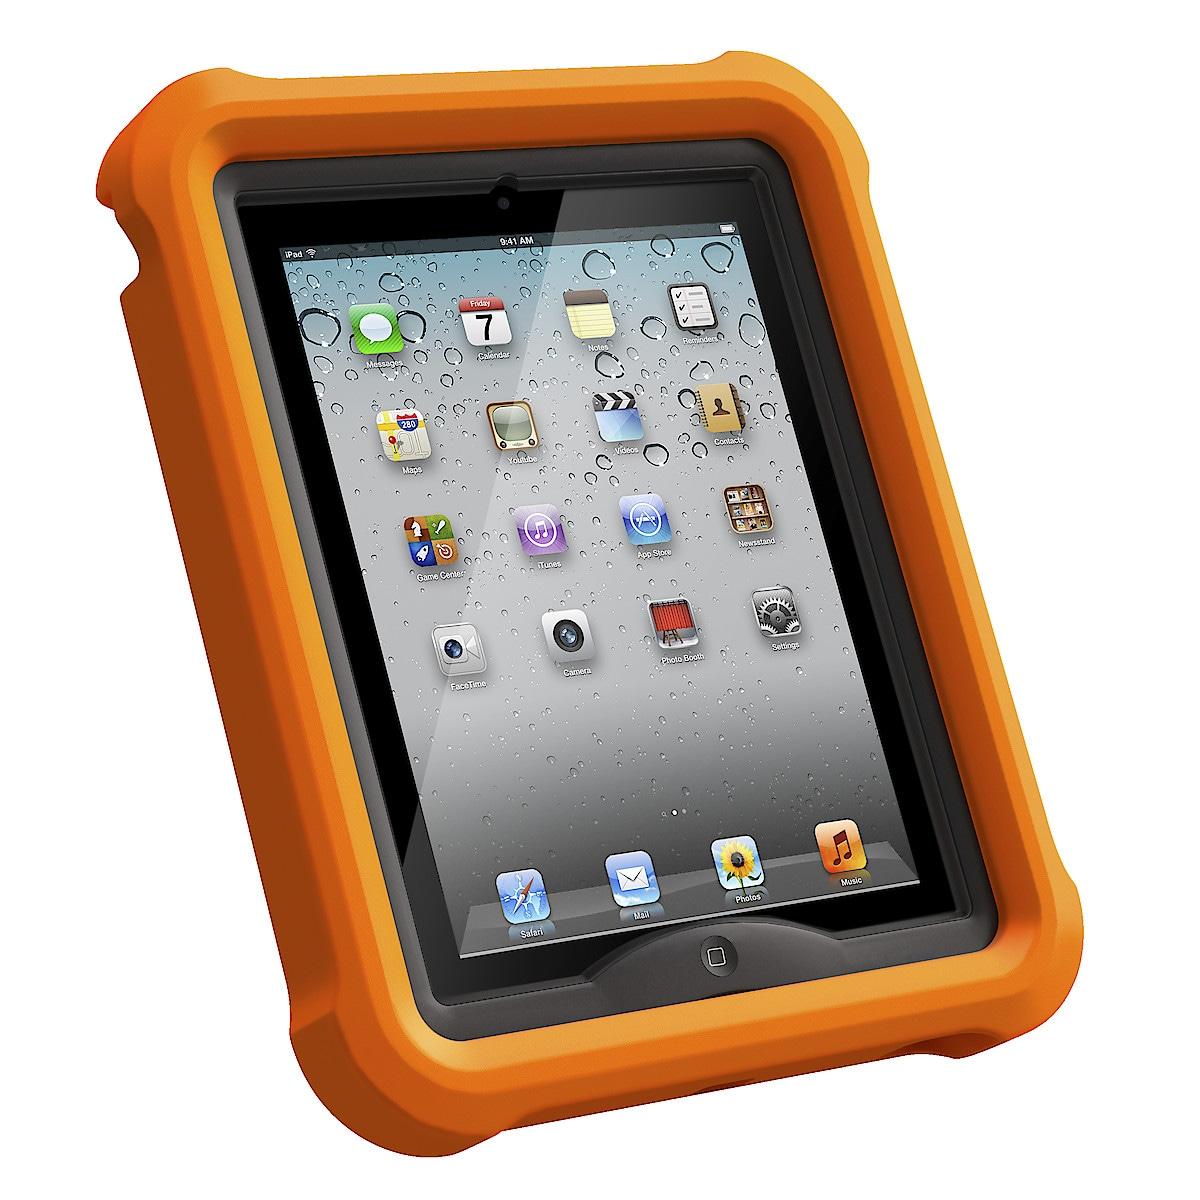 Lifeproof Lifejacket Mobile Phone Float Case for iPad